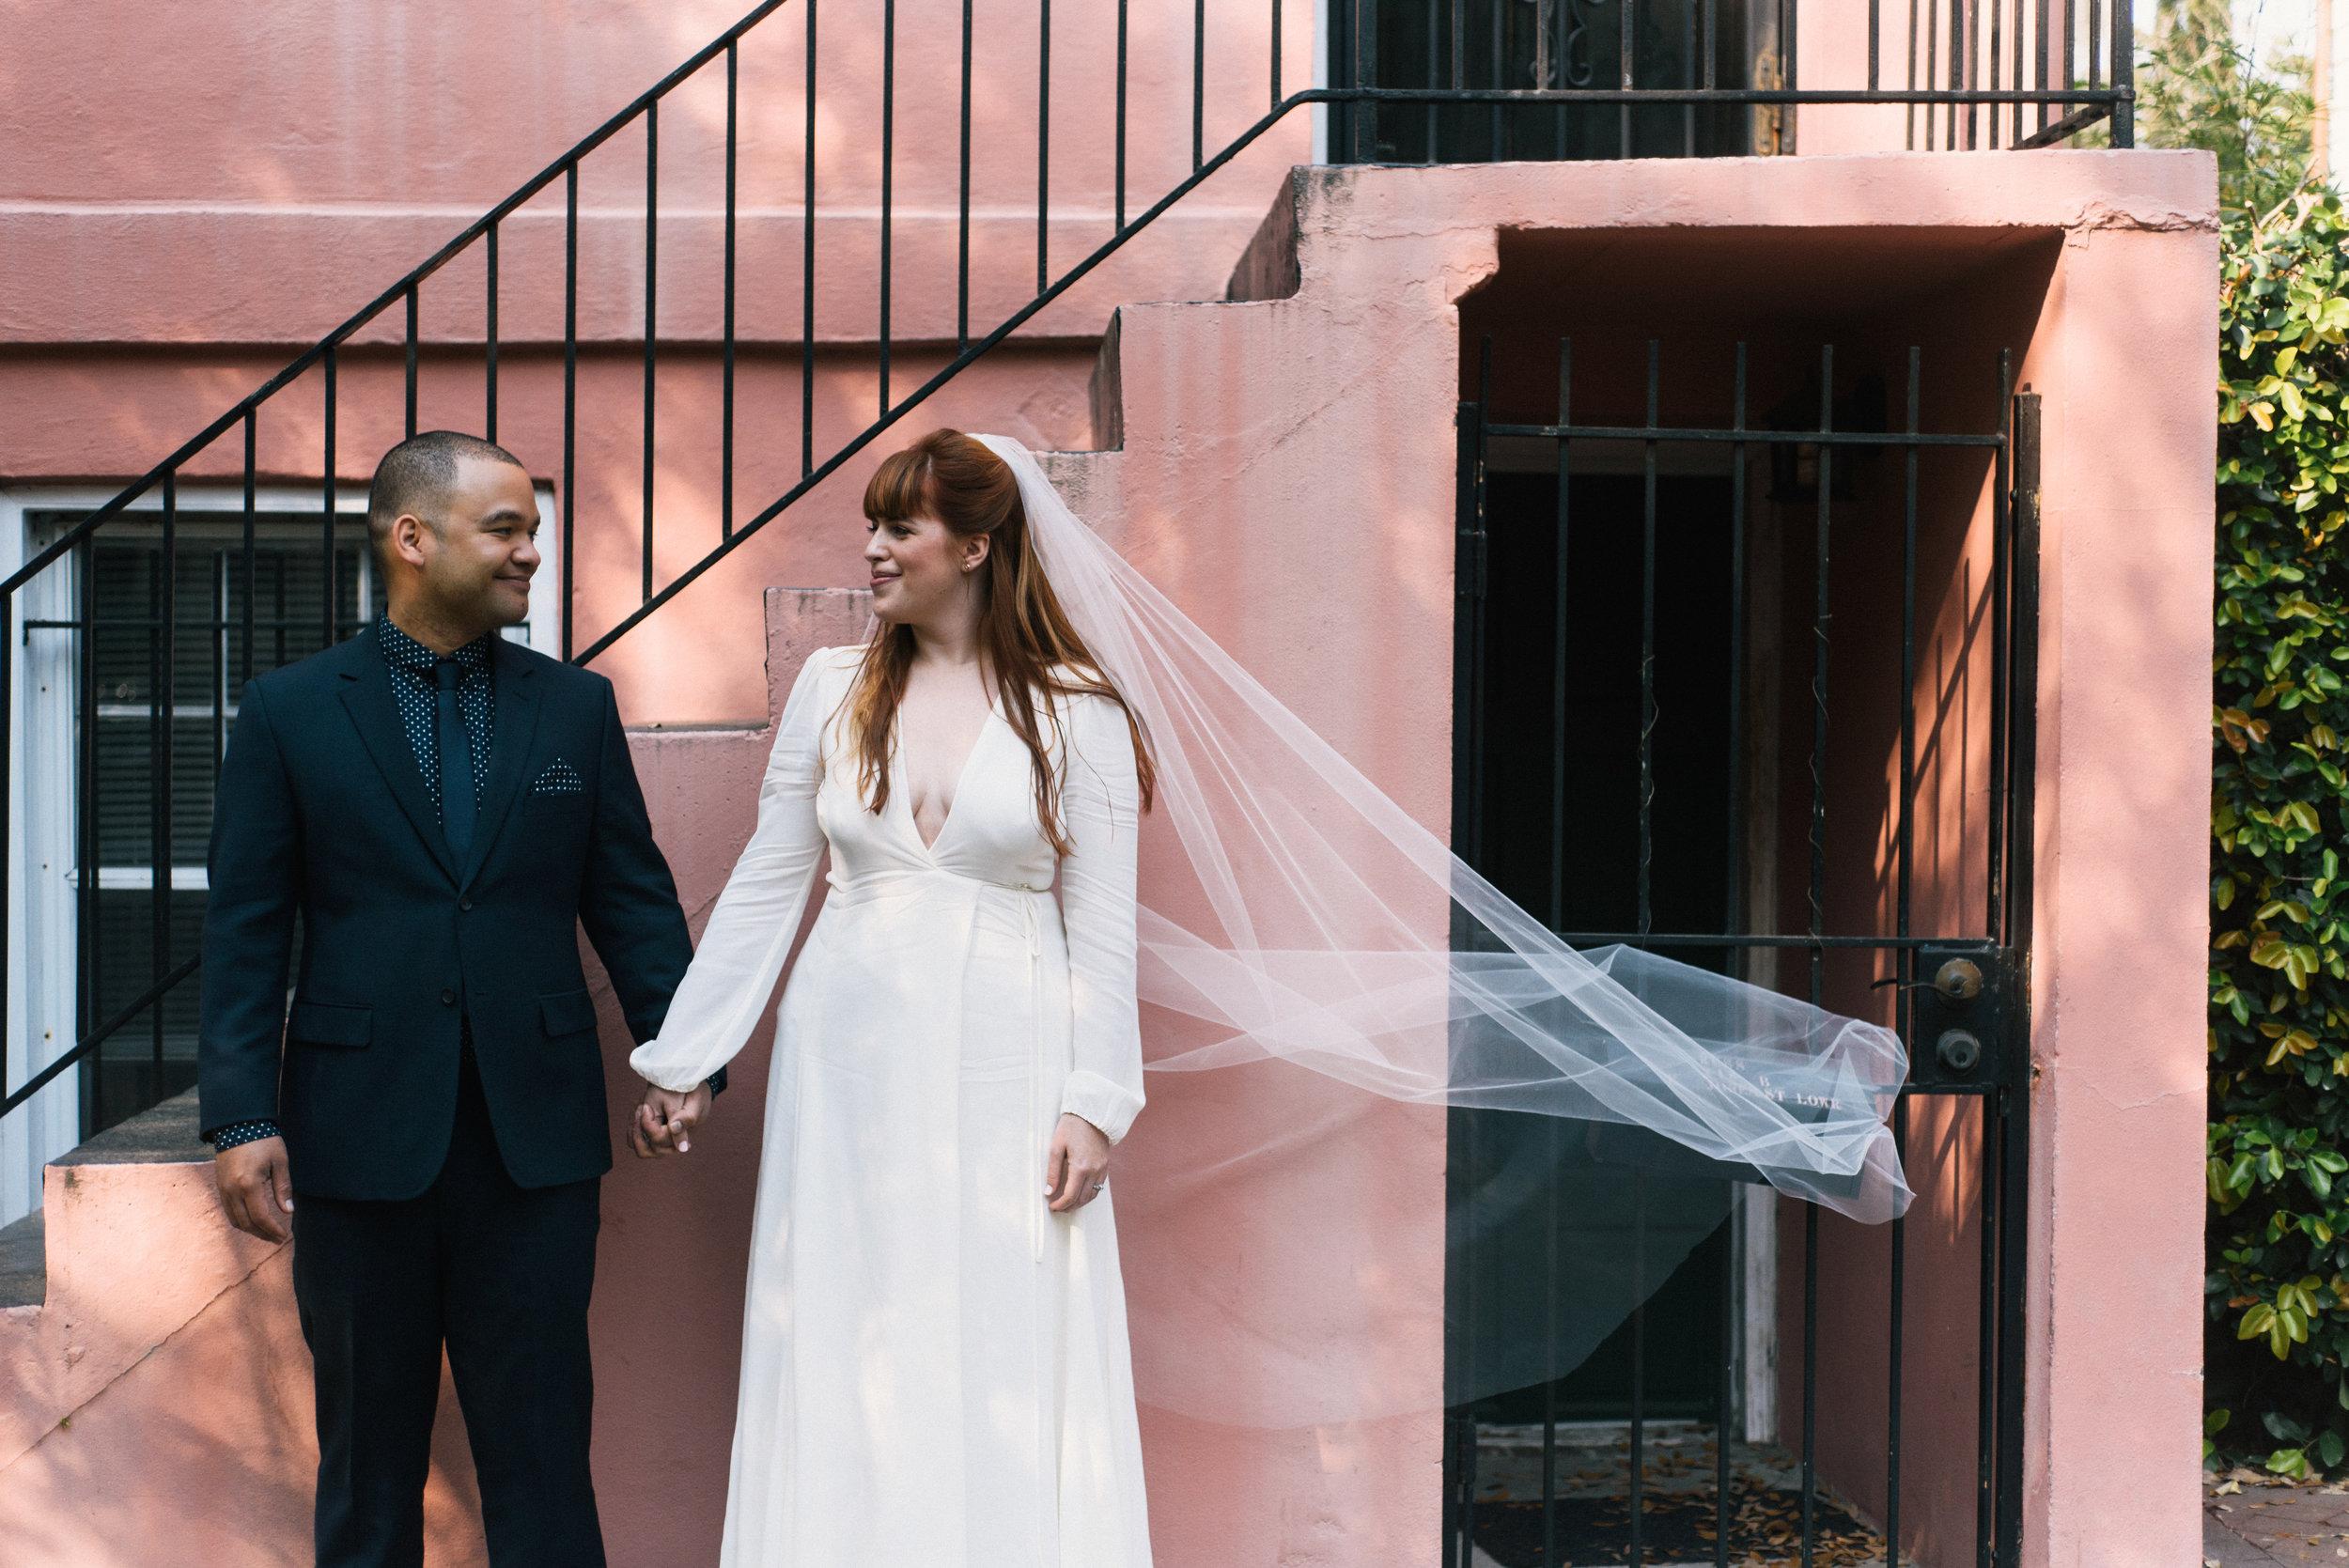 savannah-elopement-photography-savannah-georgia-elopement-photographer-savannah-wedding-photographer-meg-hill-photo-jade-hill- (20 of 58).jpg